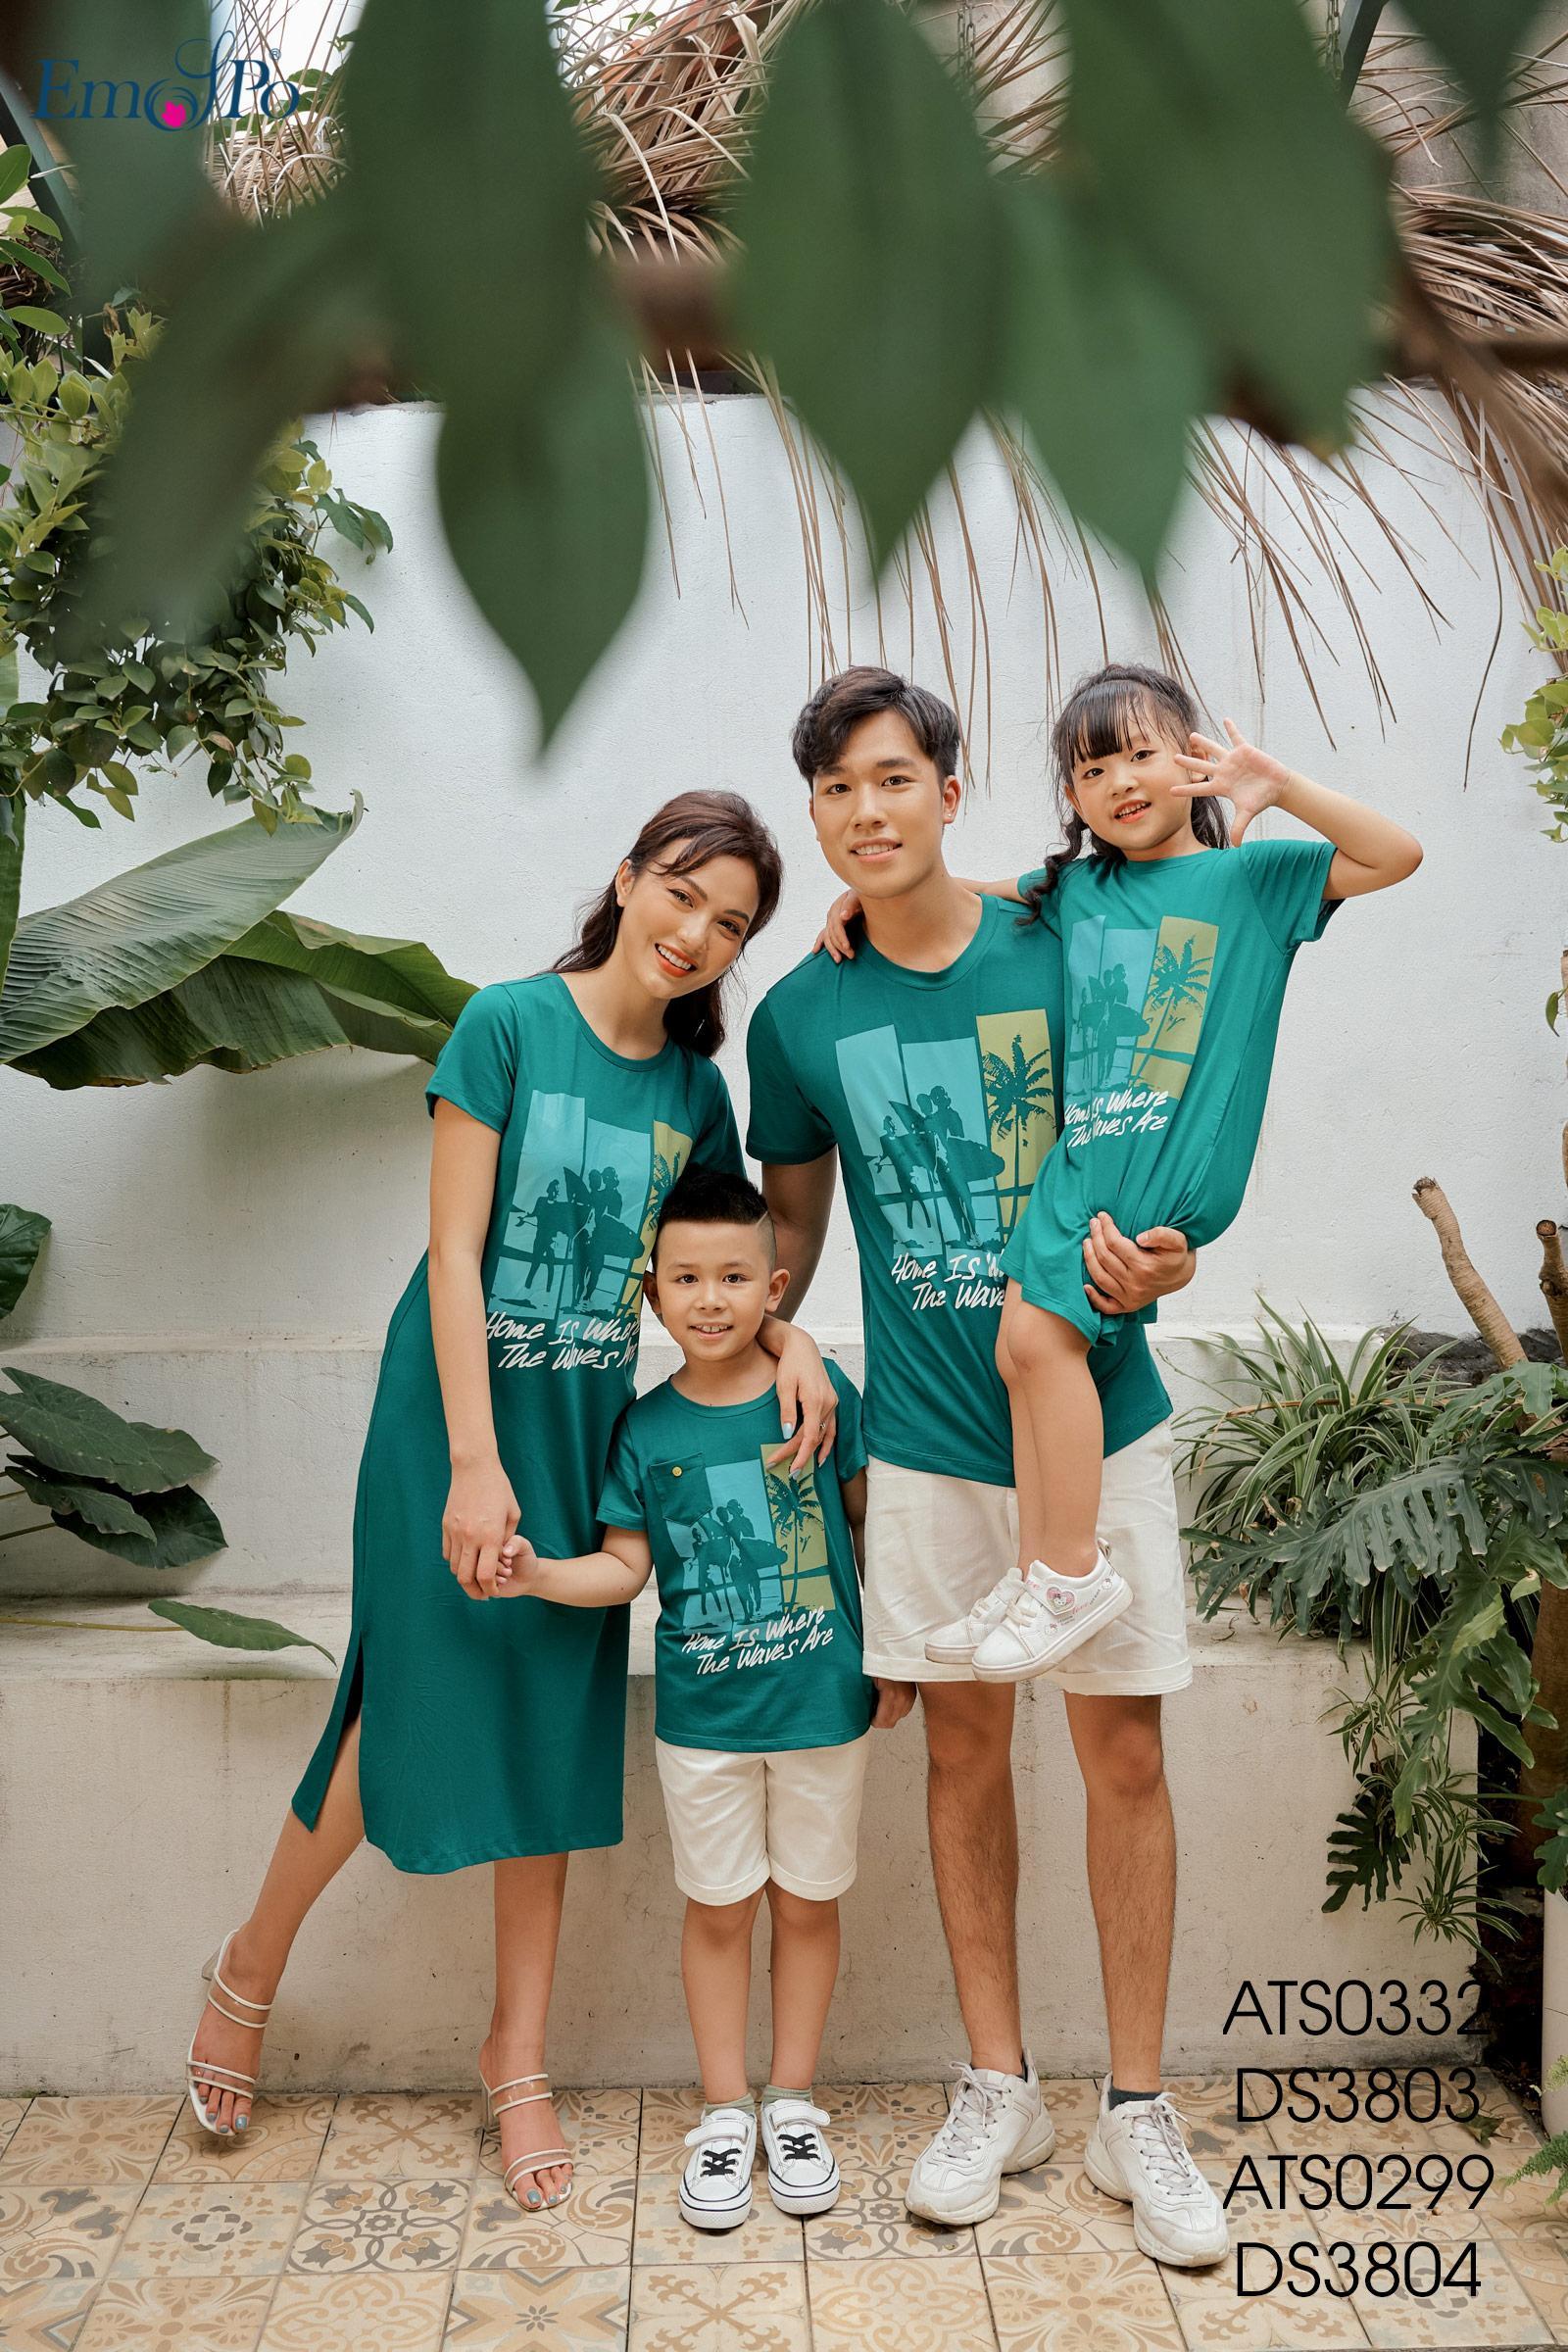 ao-thun-be-trai-co-tron-tay-coc-ats0299